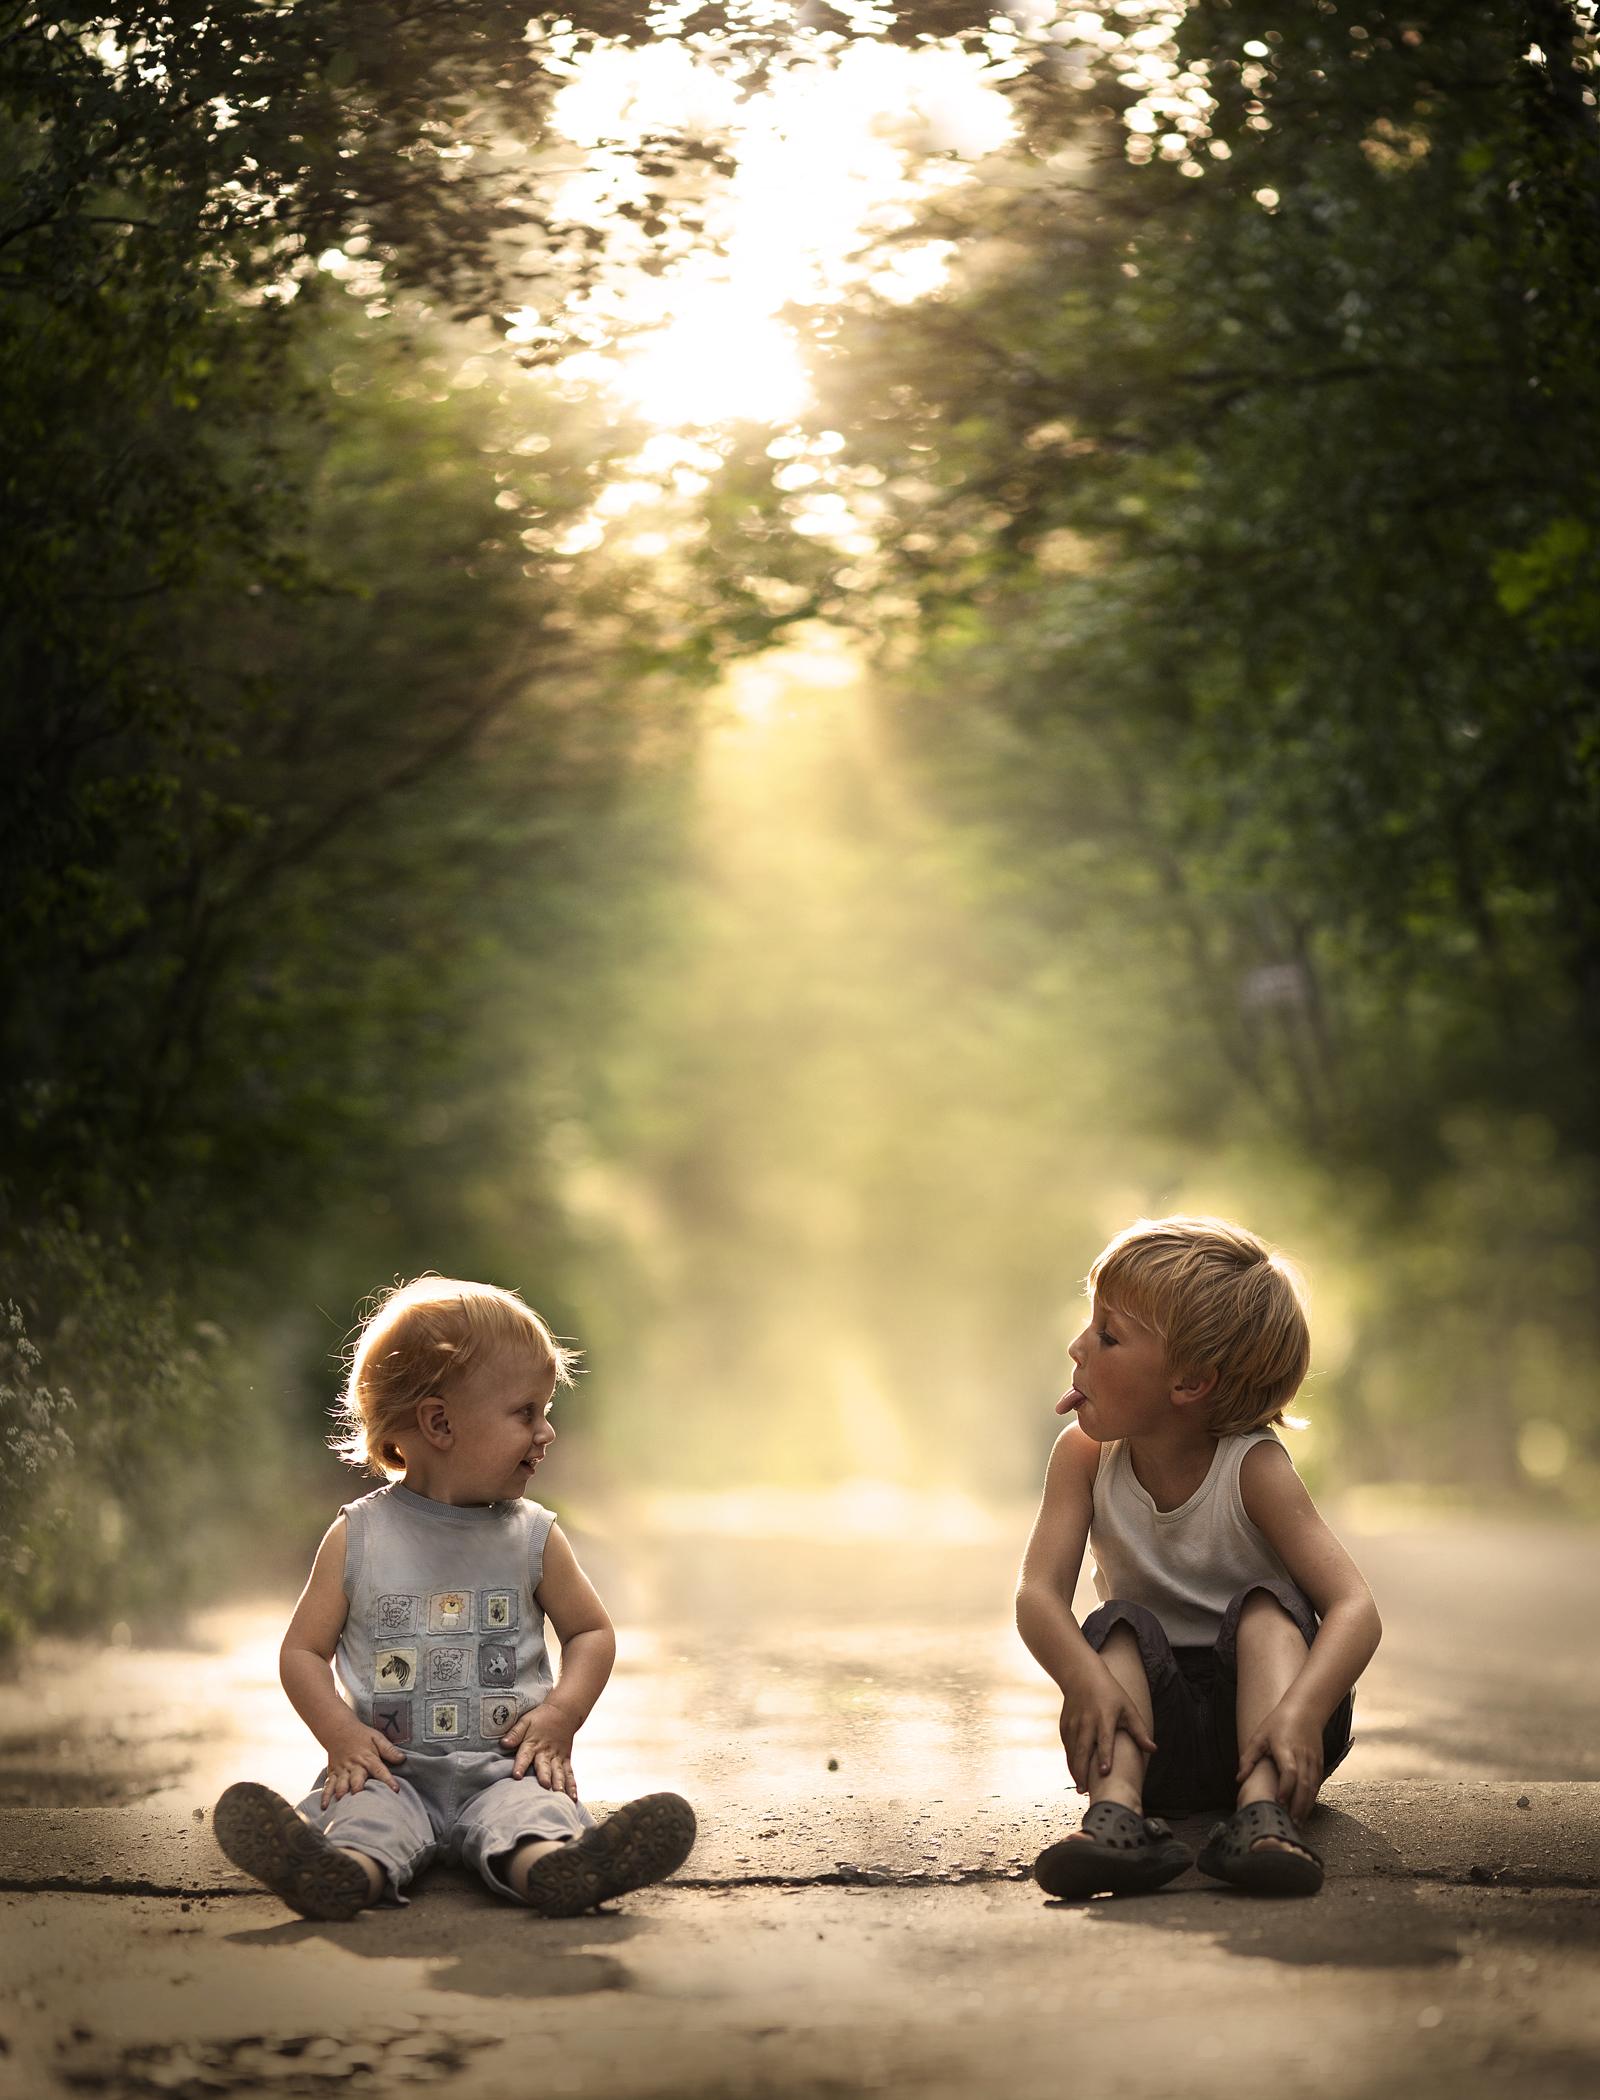 Elena memiliki dua anak laki-laki berusia 5 tahun dan 2 tahun. Foto-foto yang dibintangi dua anak laki-lakinya tersebut bukanlah produk dari sesi foto khusus.